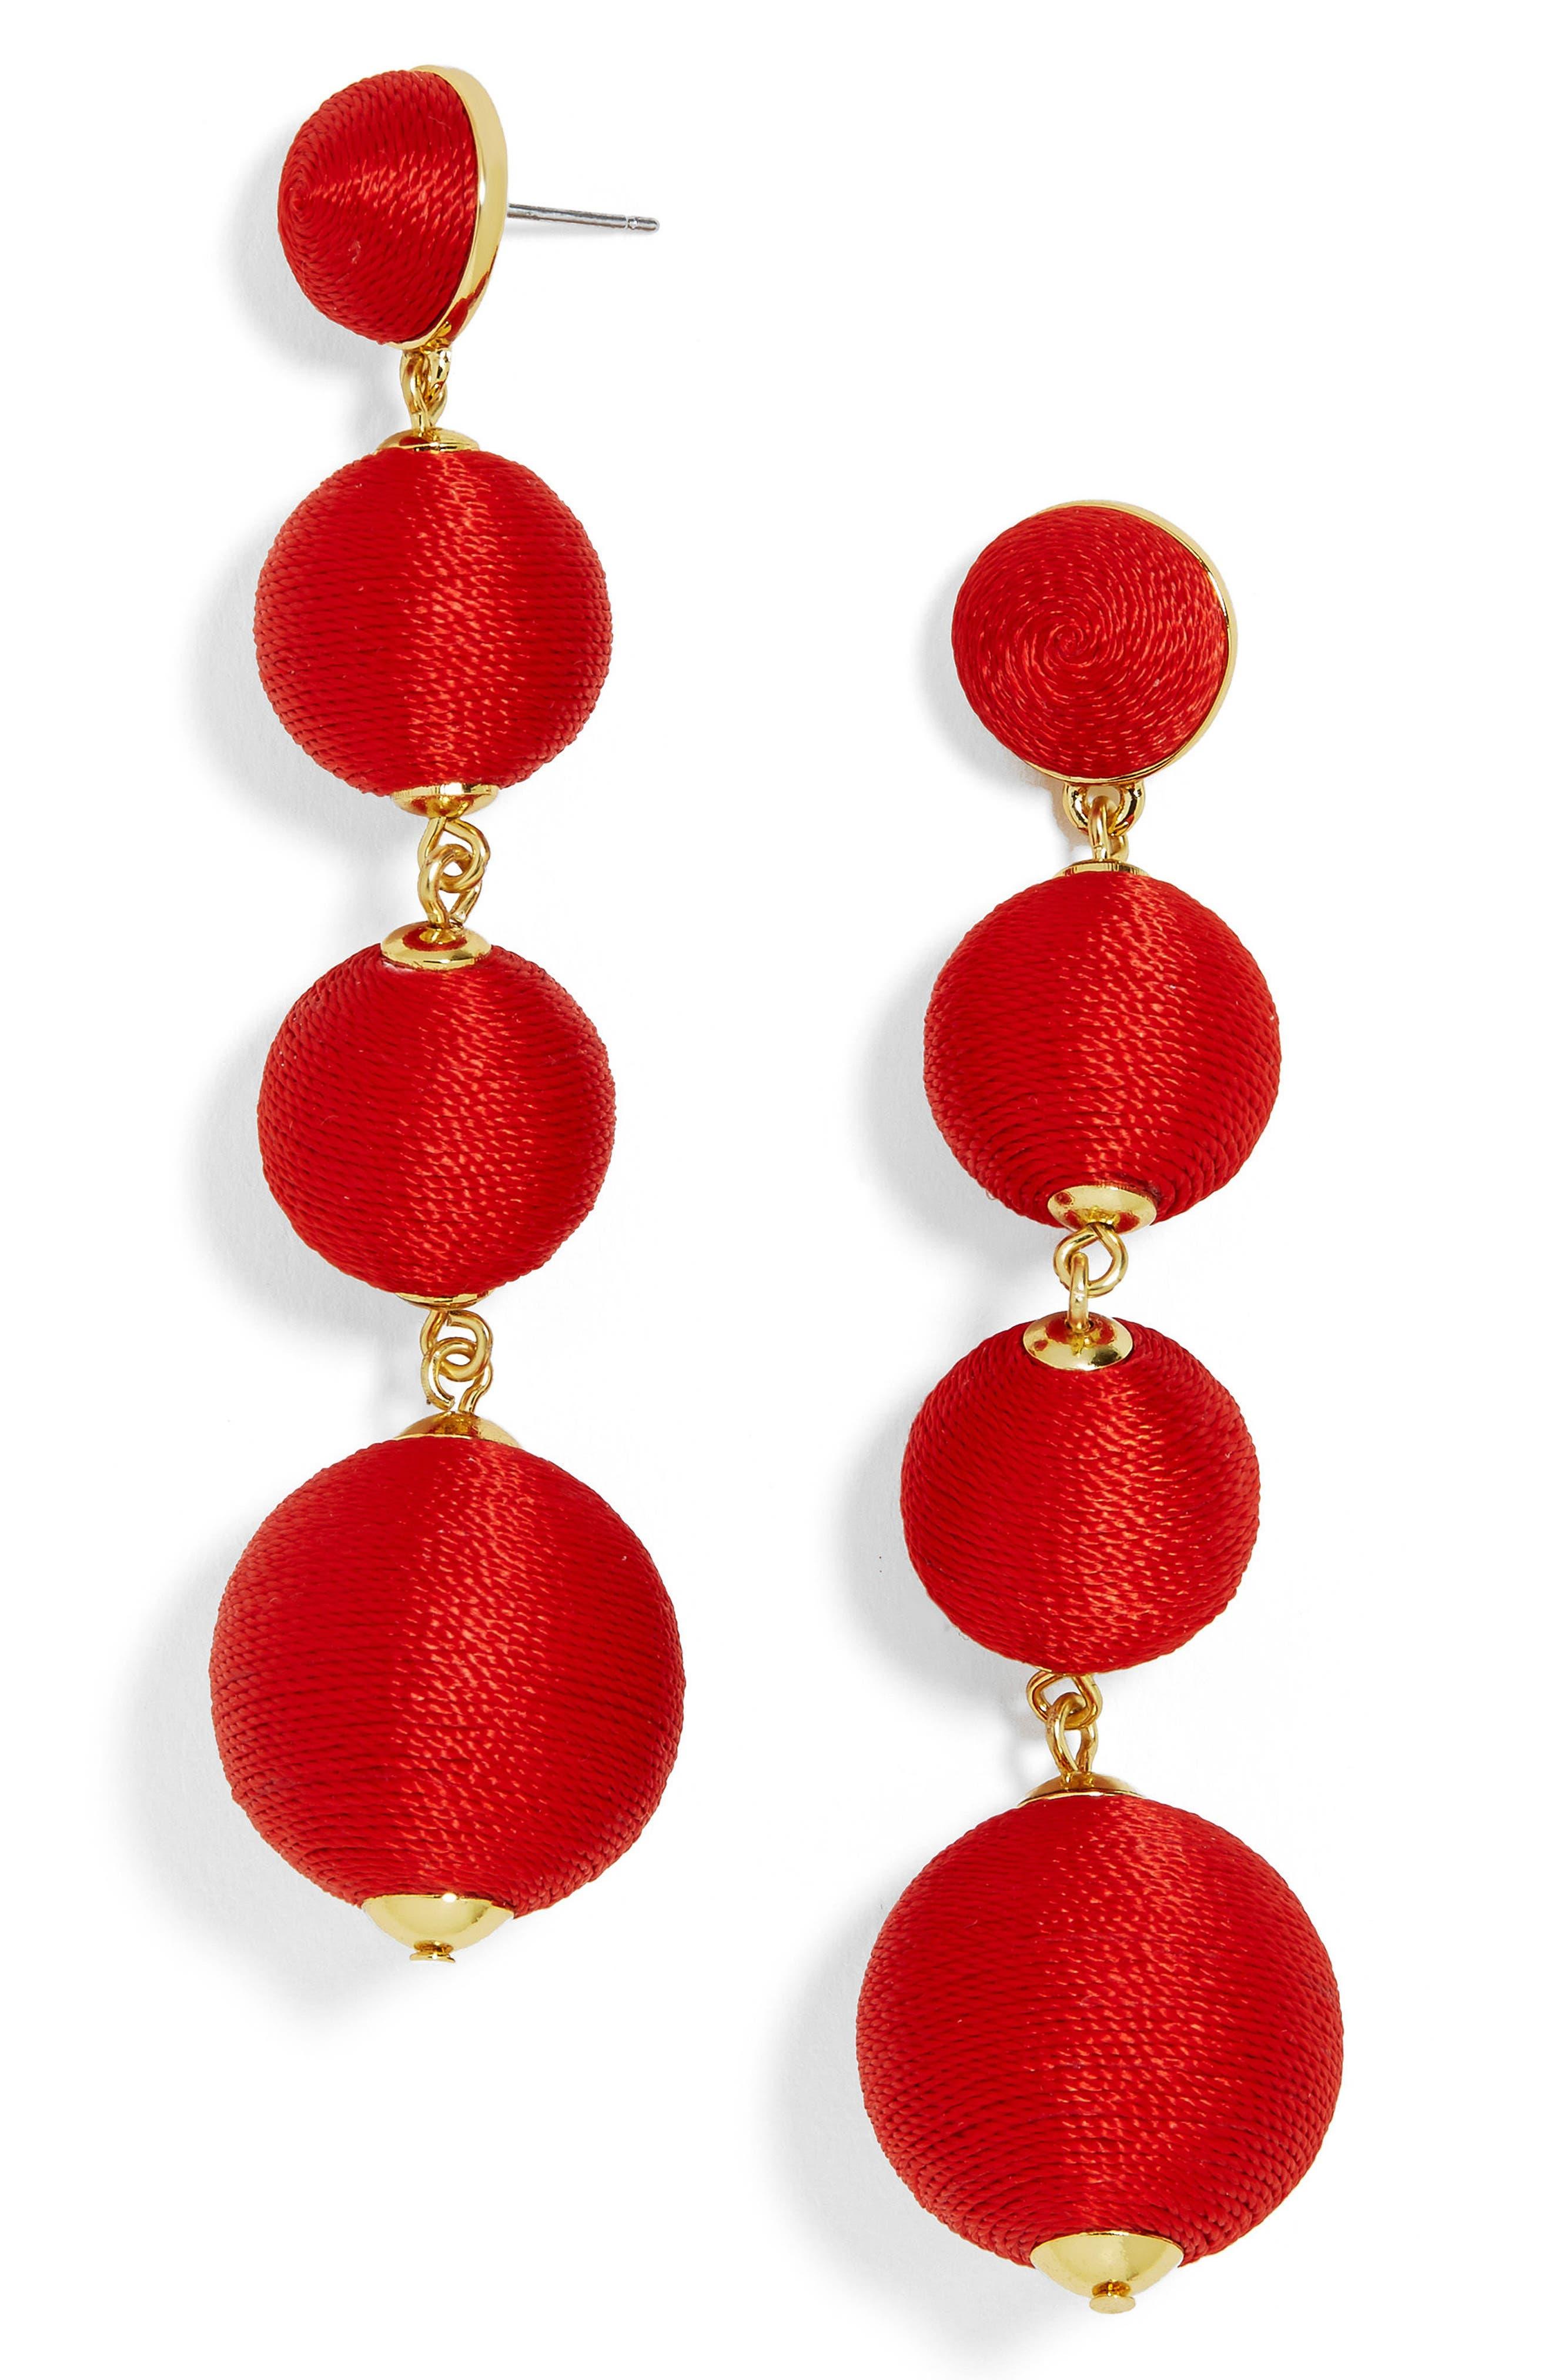 Criselda Ball Shoulder Duster Earrings,                             Main thumbnail 5, color,